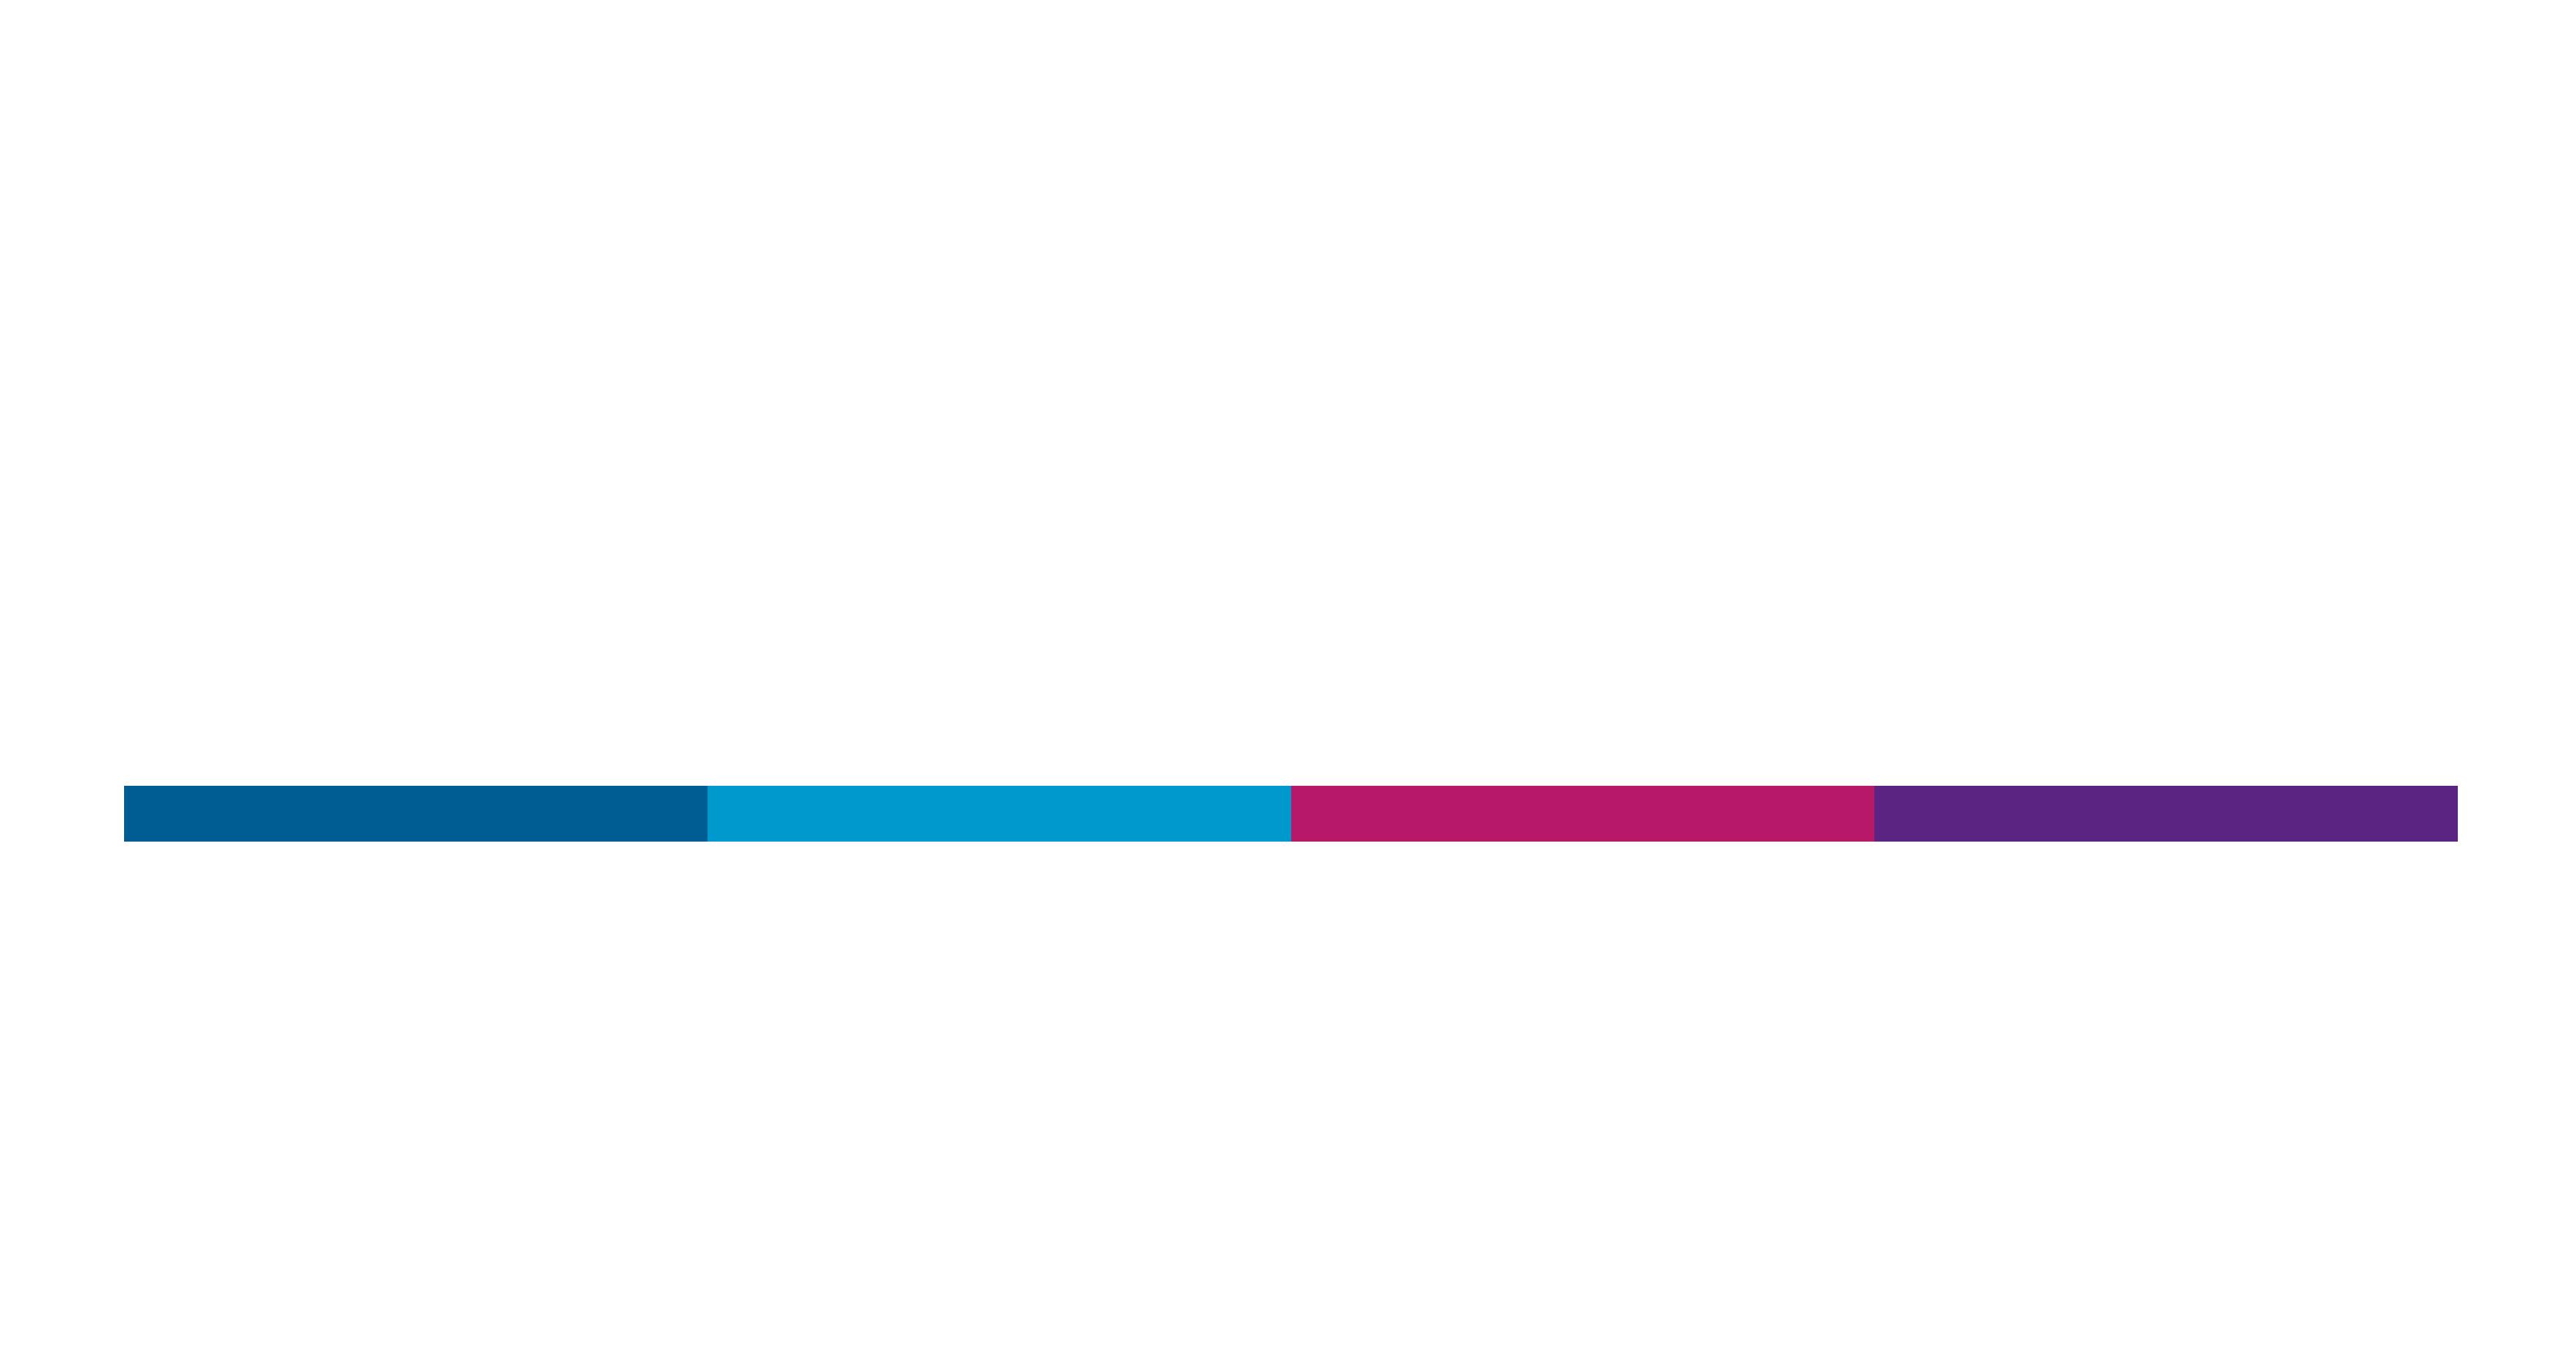 GovNet-Events-RGB-Logo-White-Colour-Bar-Large